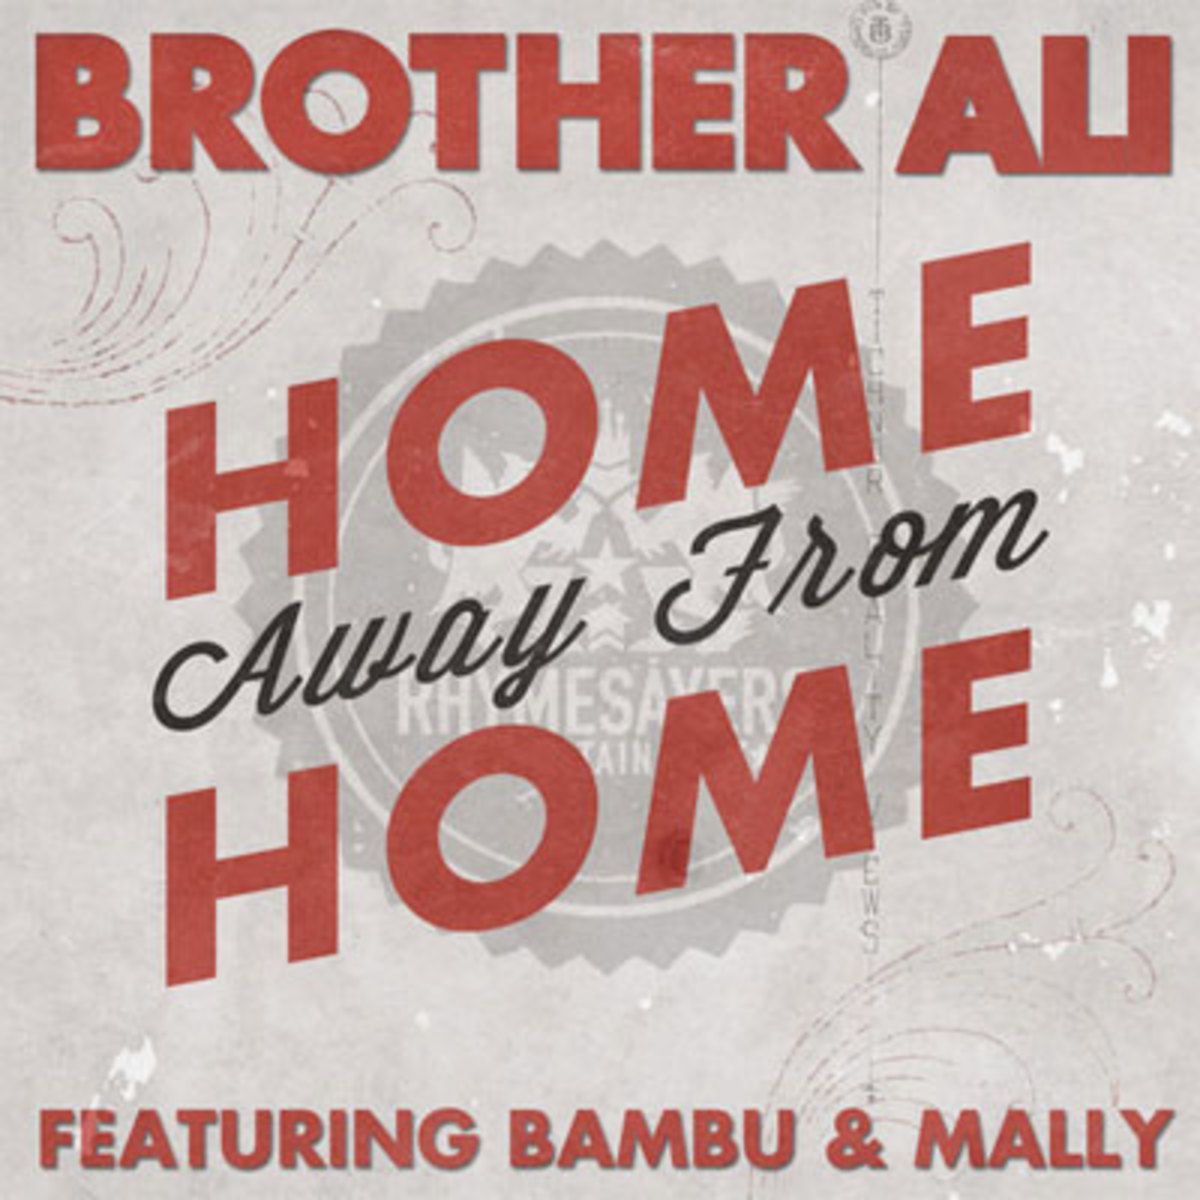 brotherali-homeawayfrom.jpg